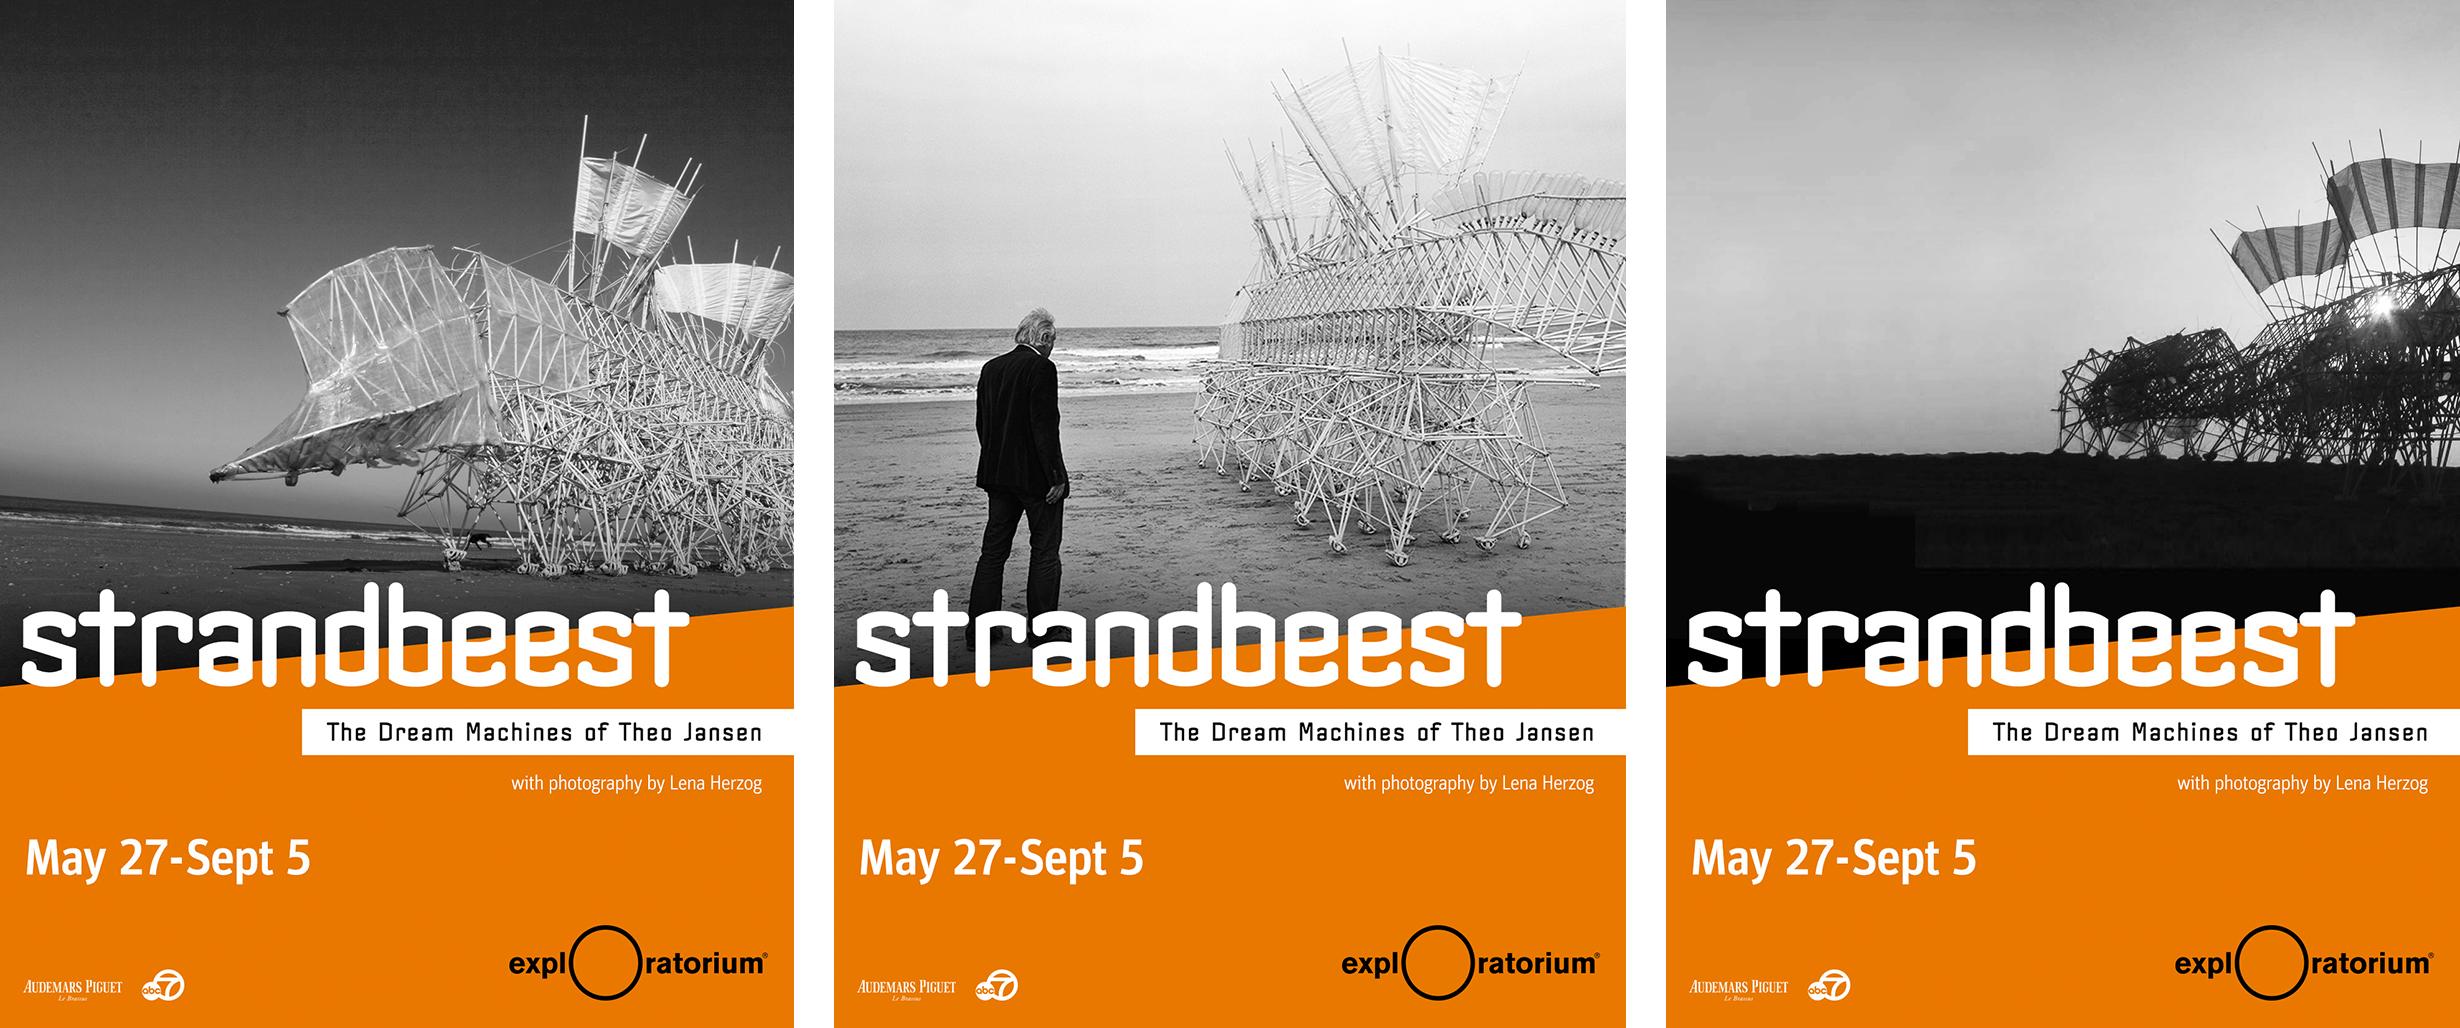 strandbeest-posters